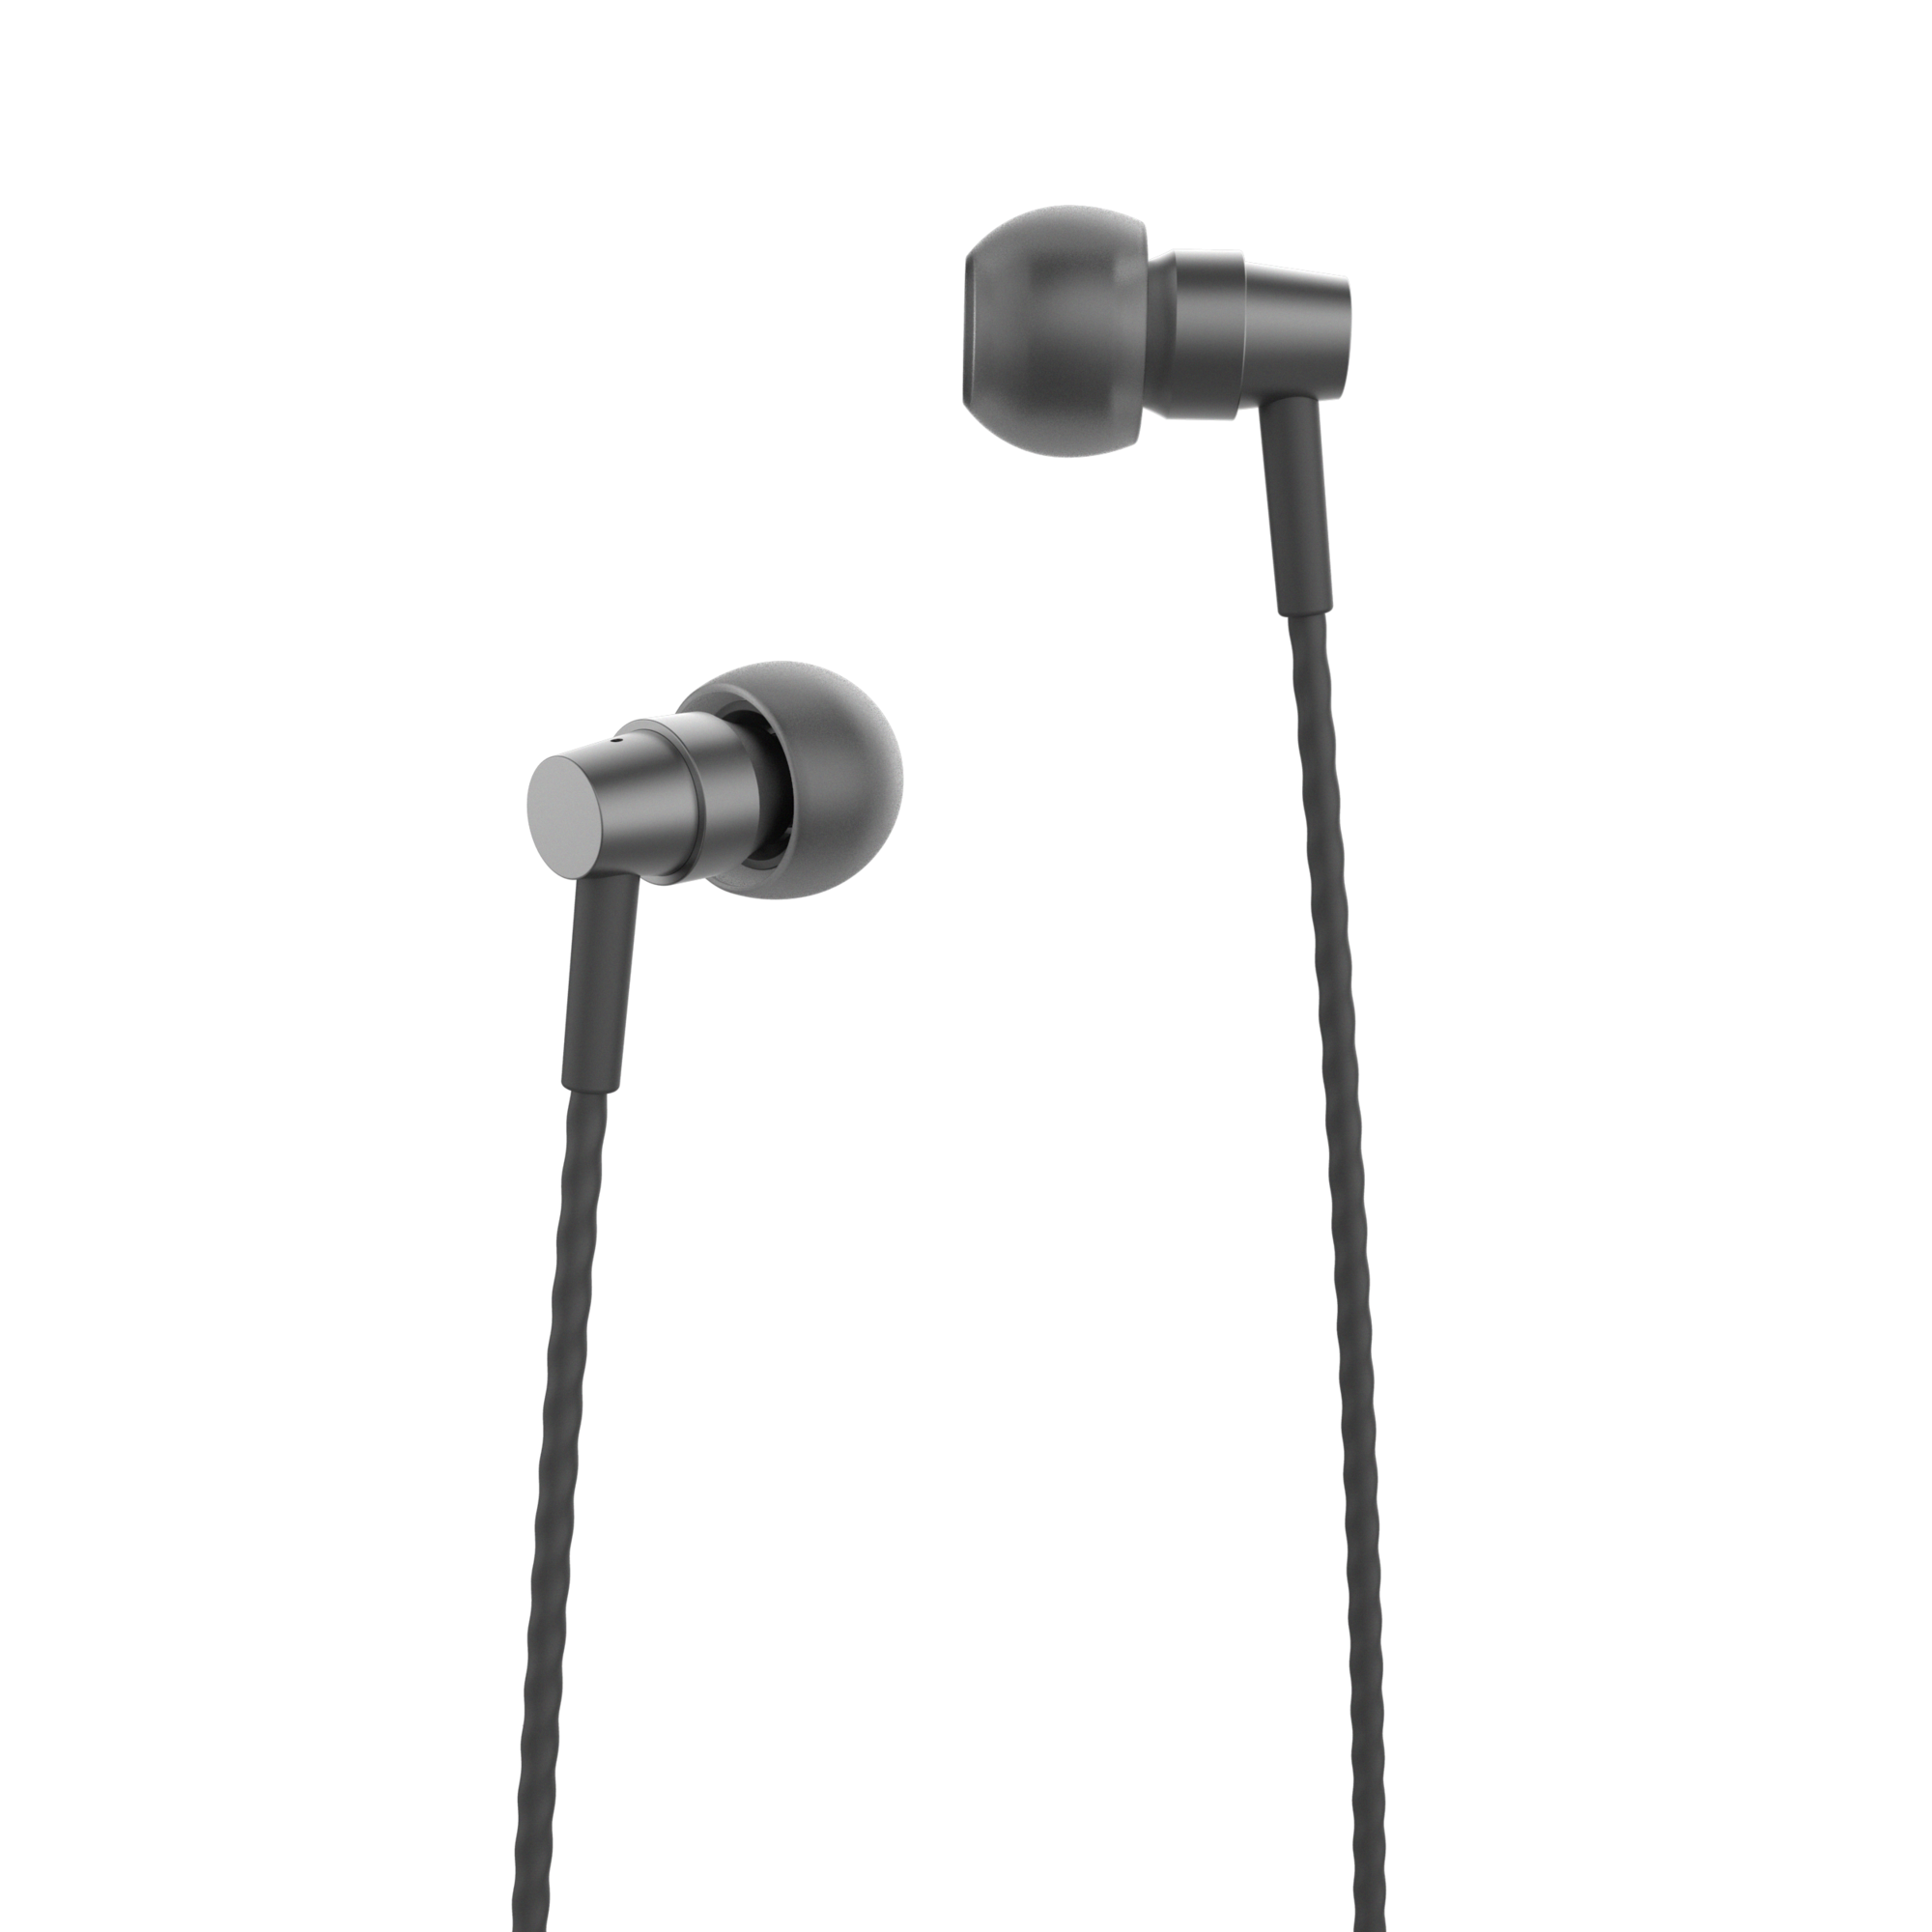 Essential Earphones Mini USB-C Headphones $27 shipped